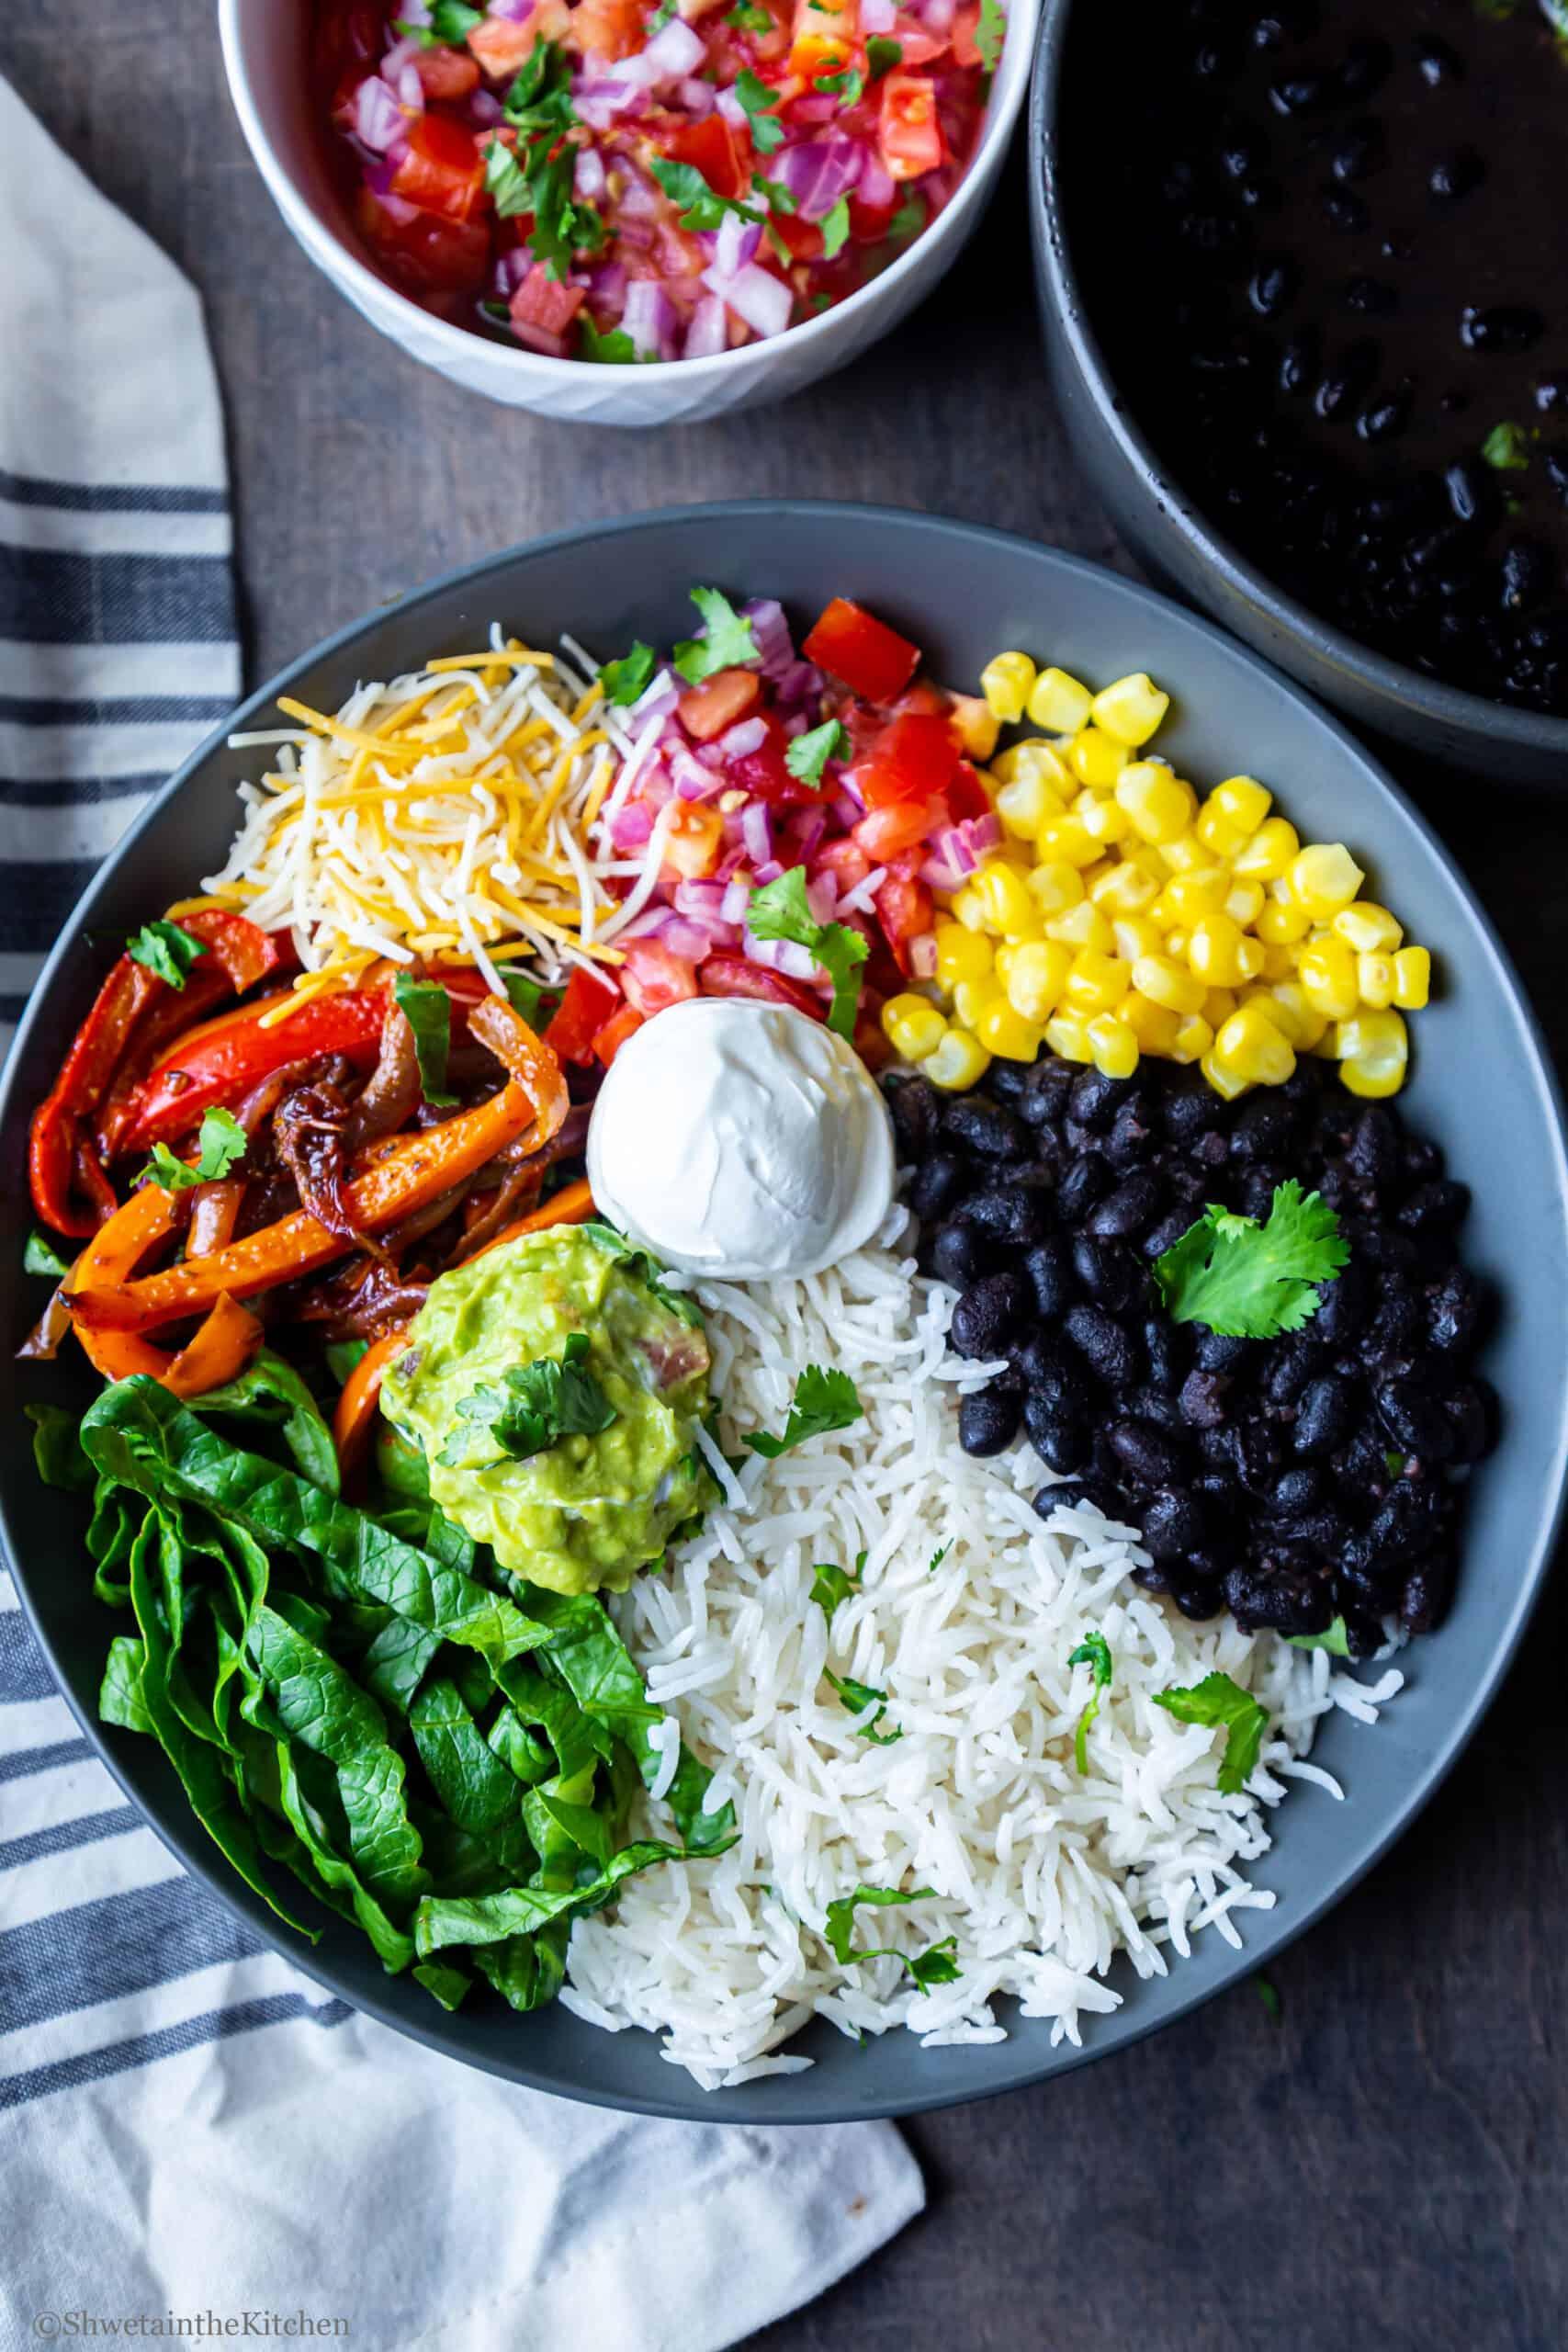 Easy Vegetarian Burrito Bowls Shweta In The Kitchen